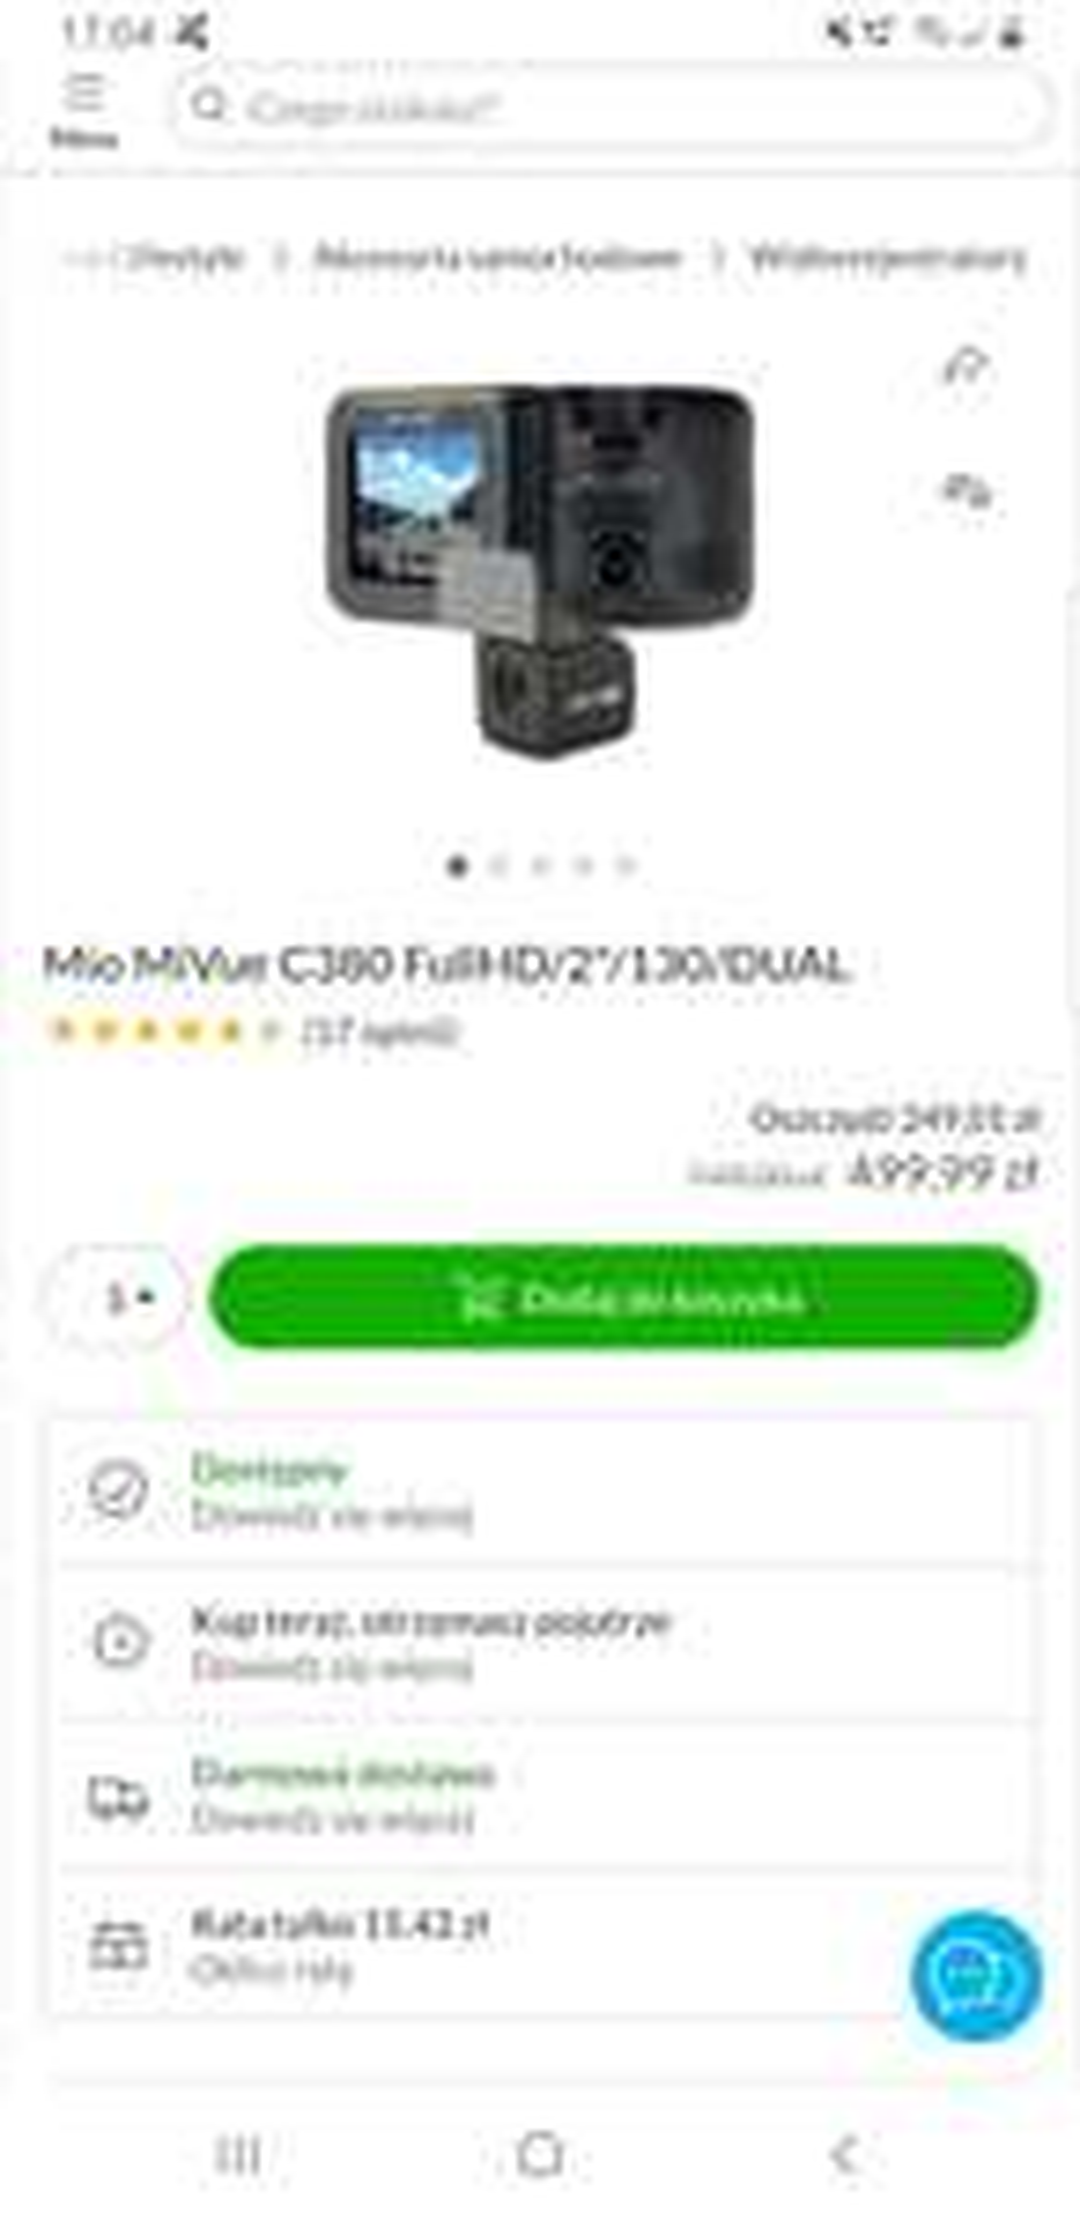 "Mio MiVue C380 FullHD/2""/130/DUAL - x-kom"